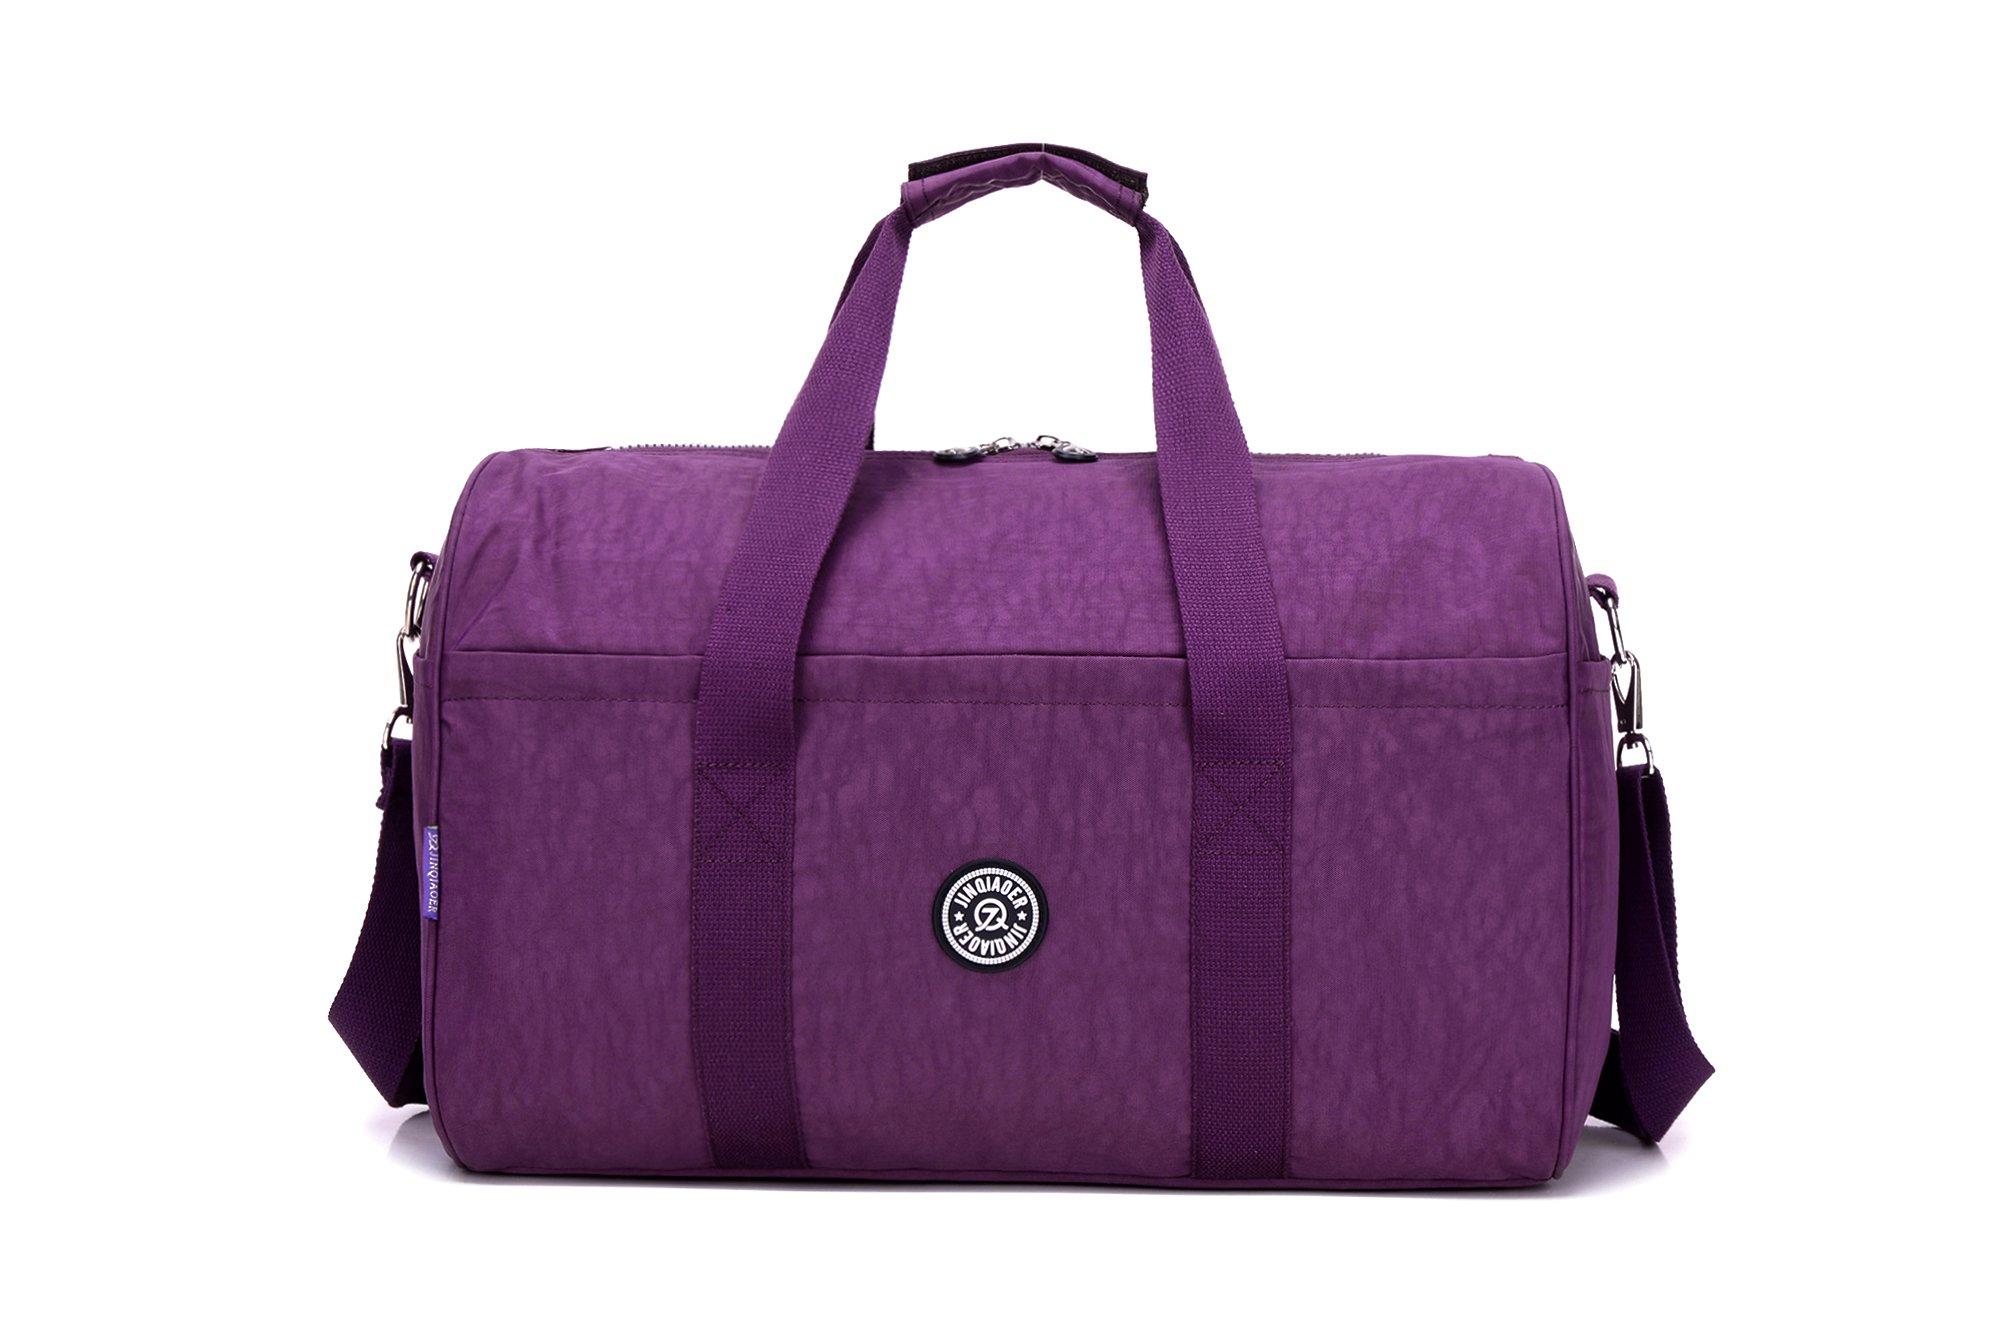 GuiShi(TM) 17'' Large Travel Sports Gym Bag Travel Duffel Bag Lightweight Nylon Water Resistant Weekend Bag (Purple)